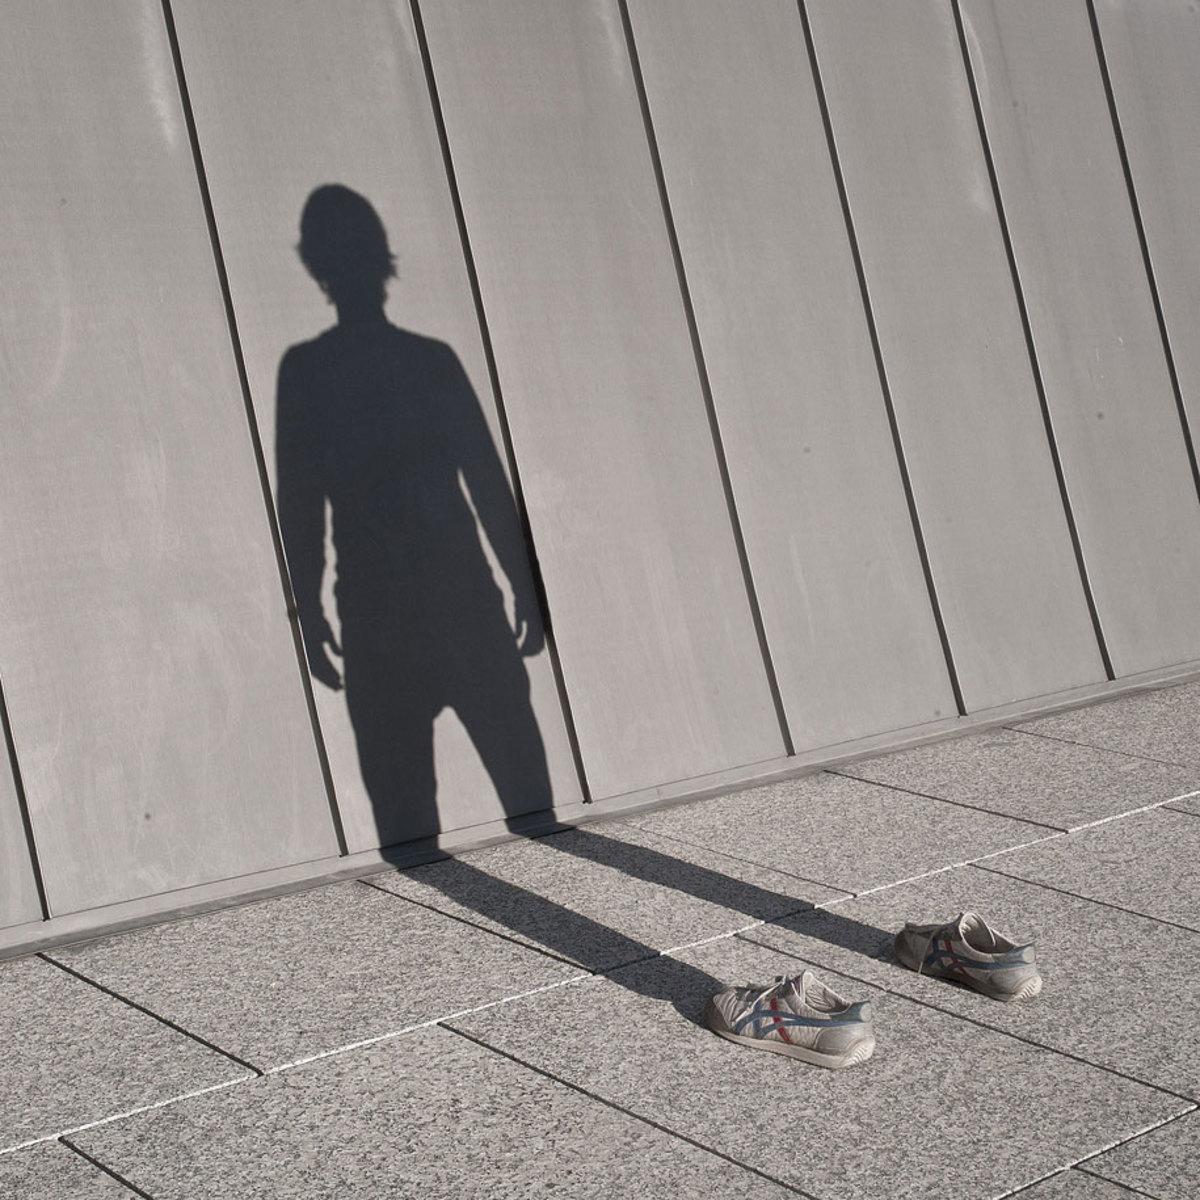 invisible-man-shadows-pol-ubeda-2